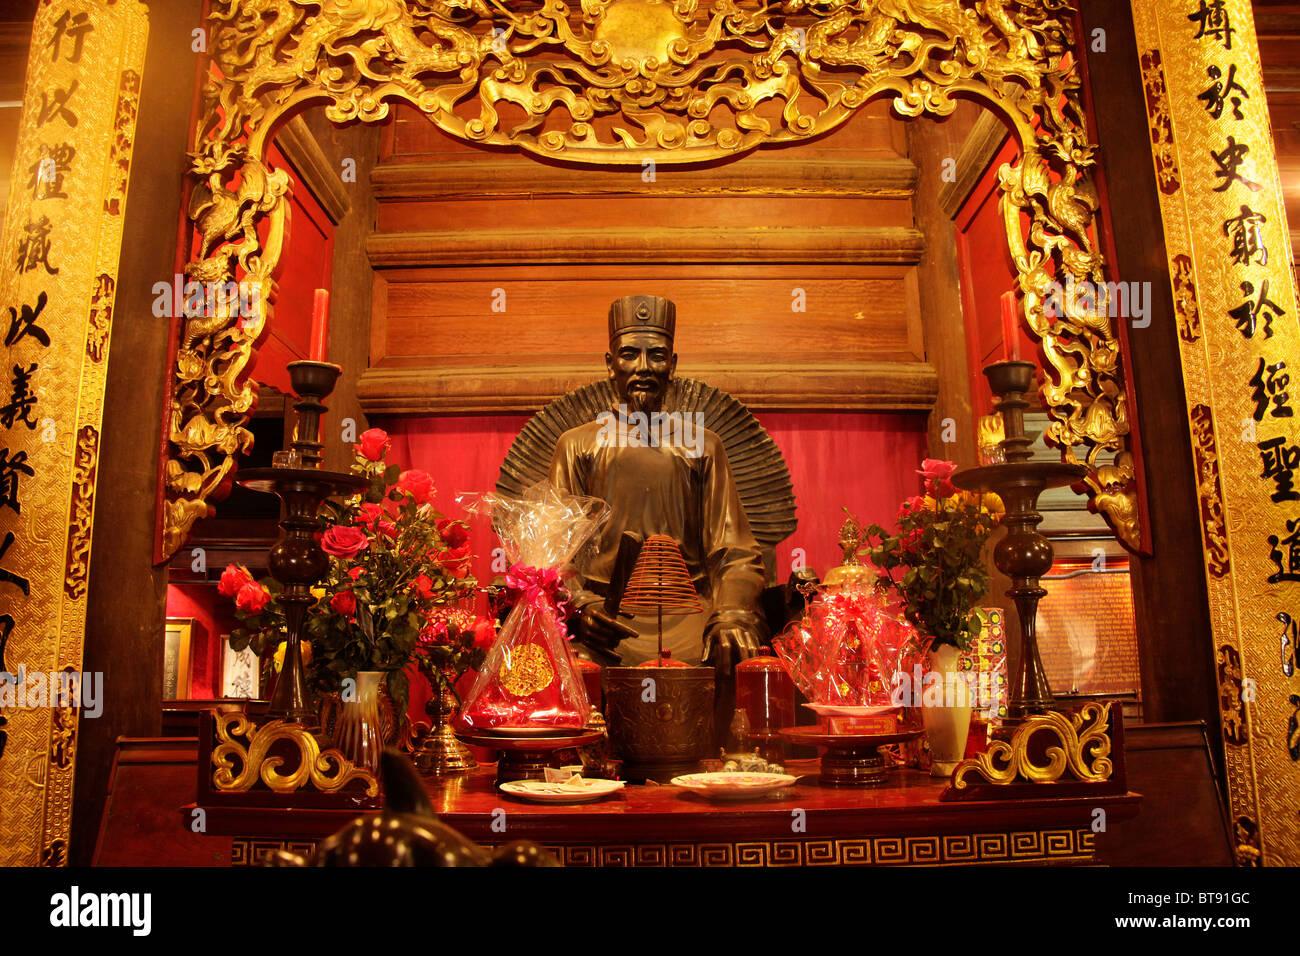 Statue in the Temple of Literature Van Mieu, Hanoi, Vietnam, Asia - Stock Image